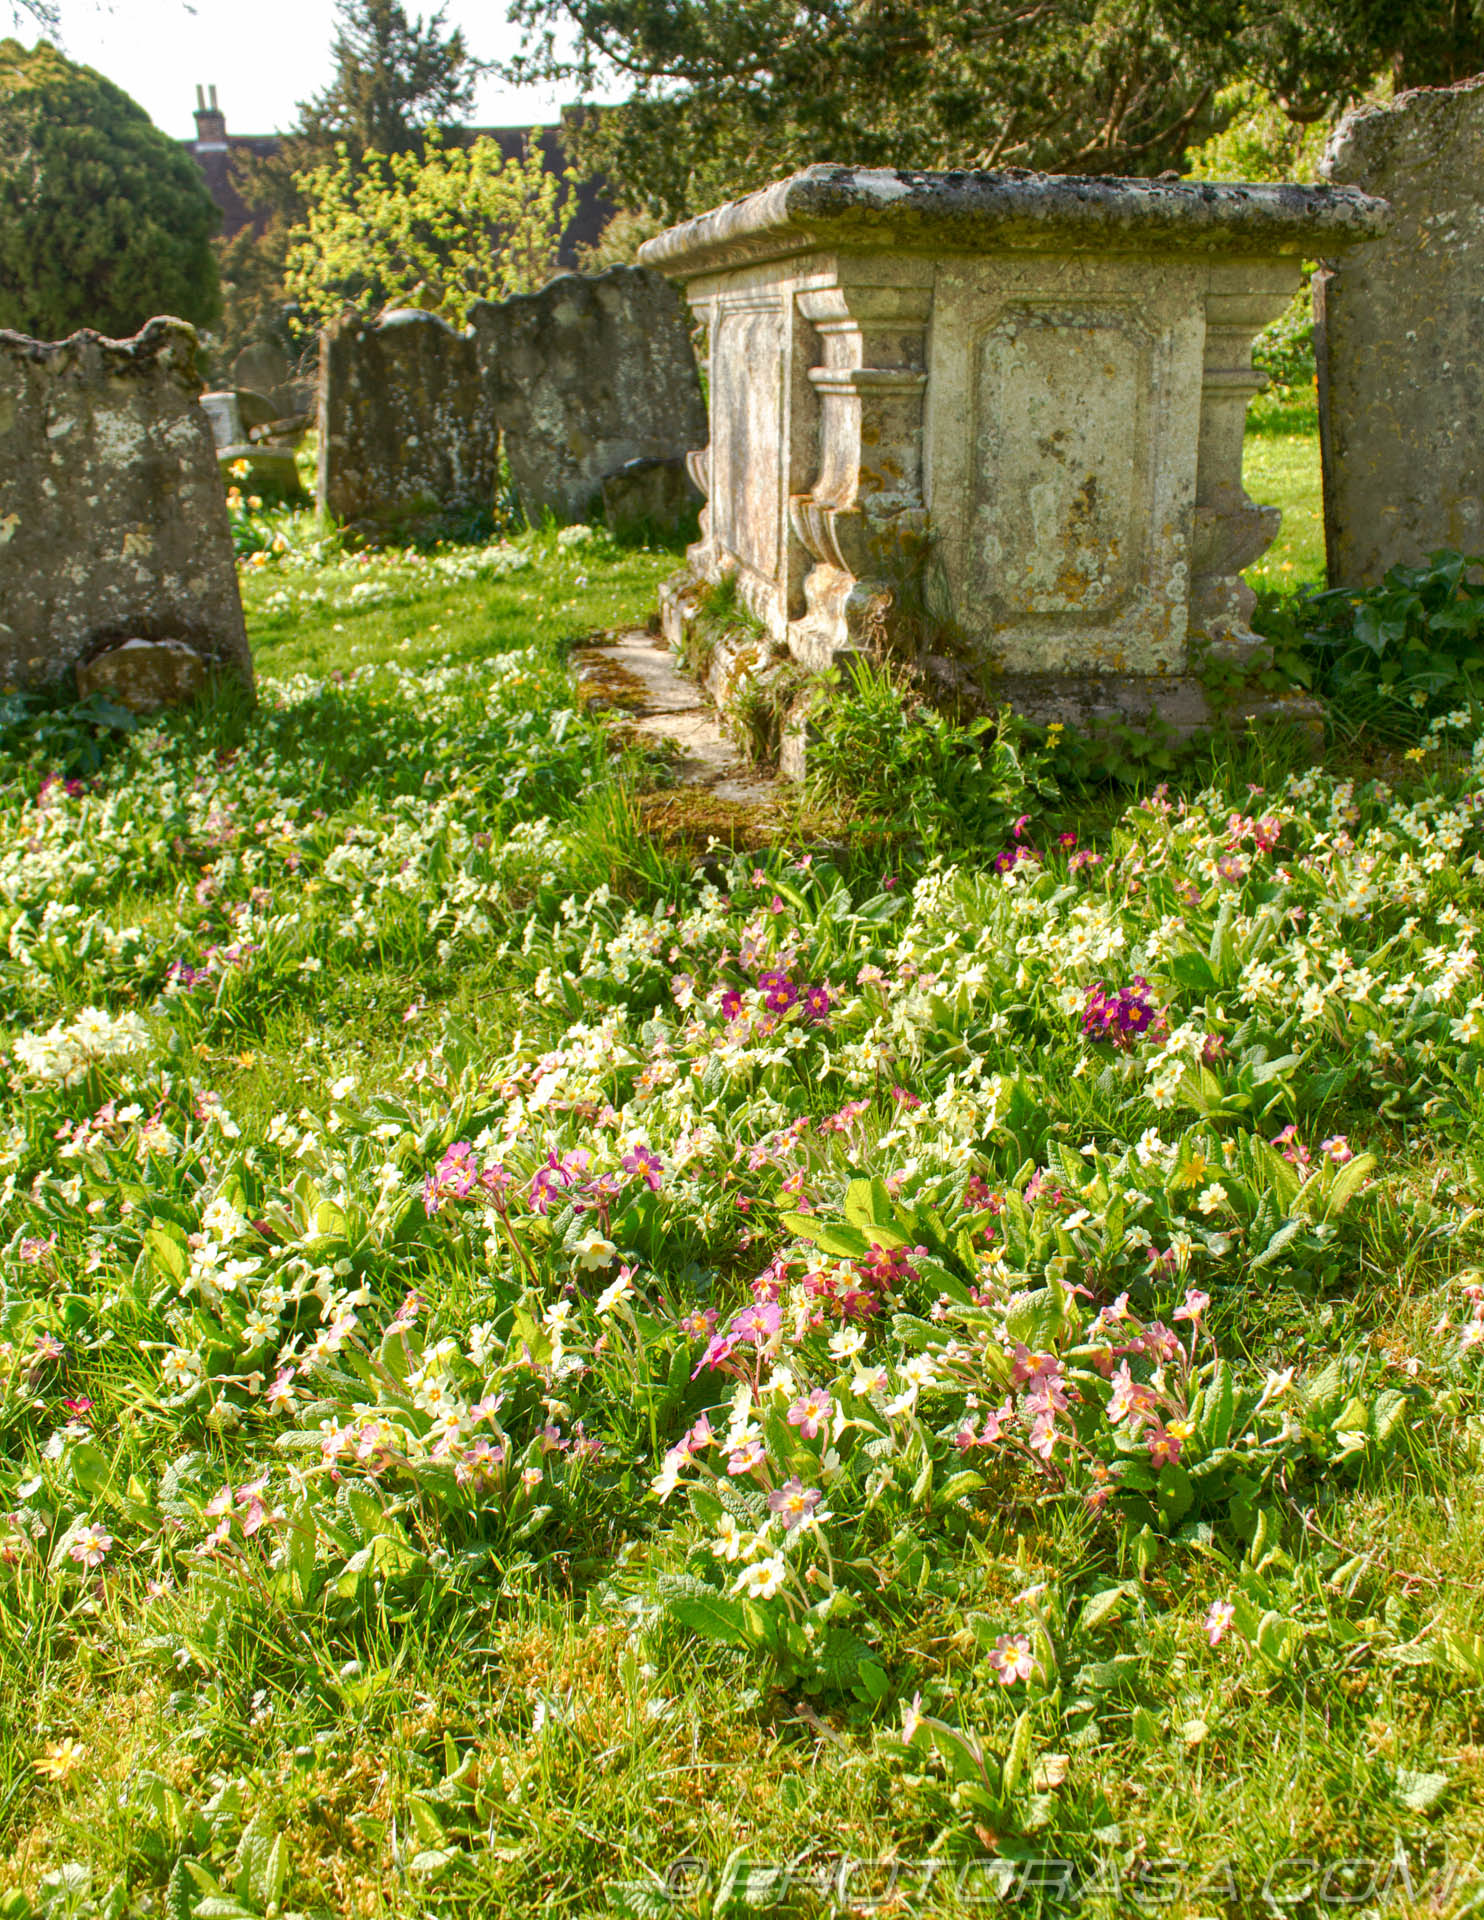 https://photorasa.com/saints-church-staplehurst-kent/wild-primroses-and-polyanthus-near-large-grave/